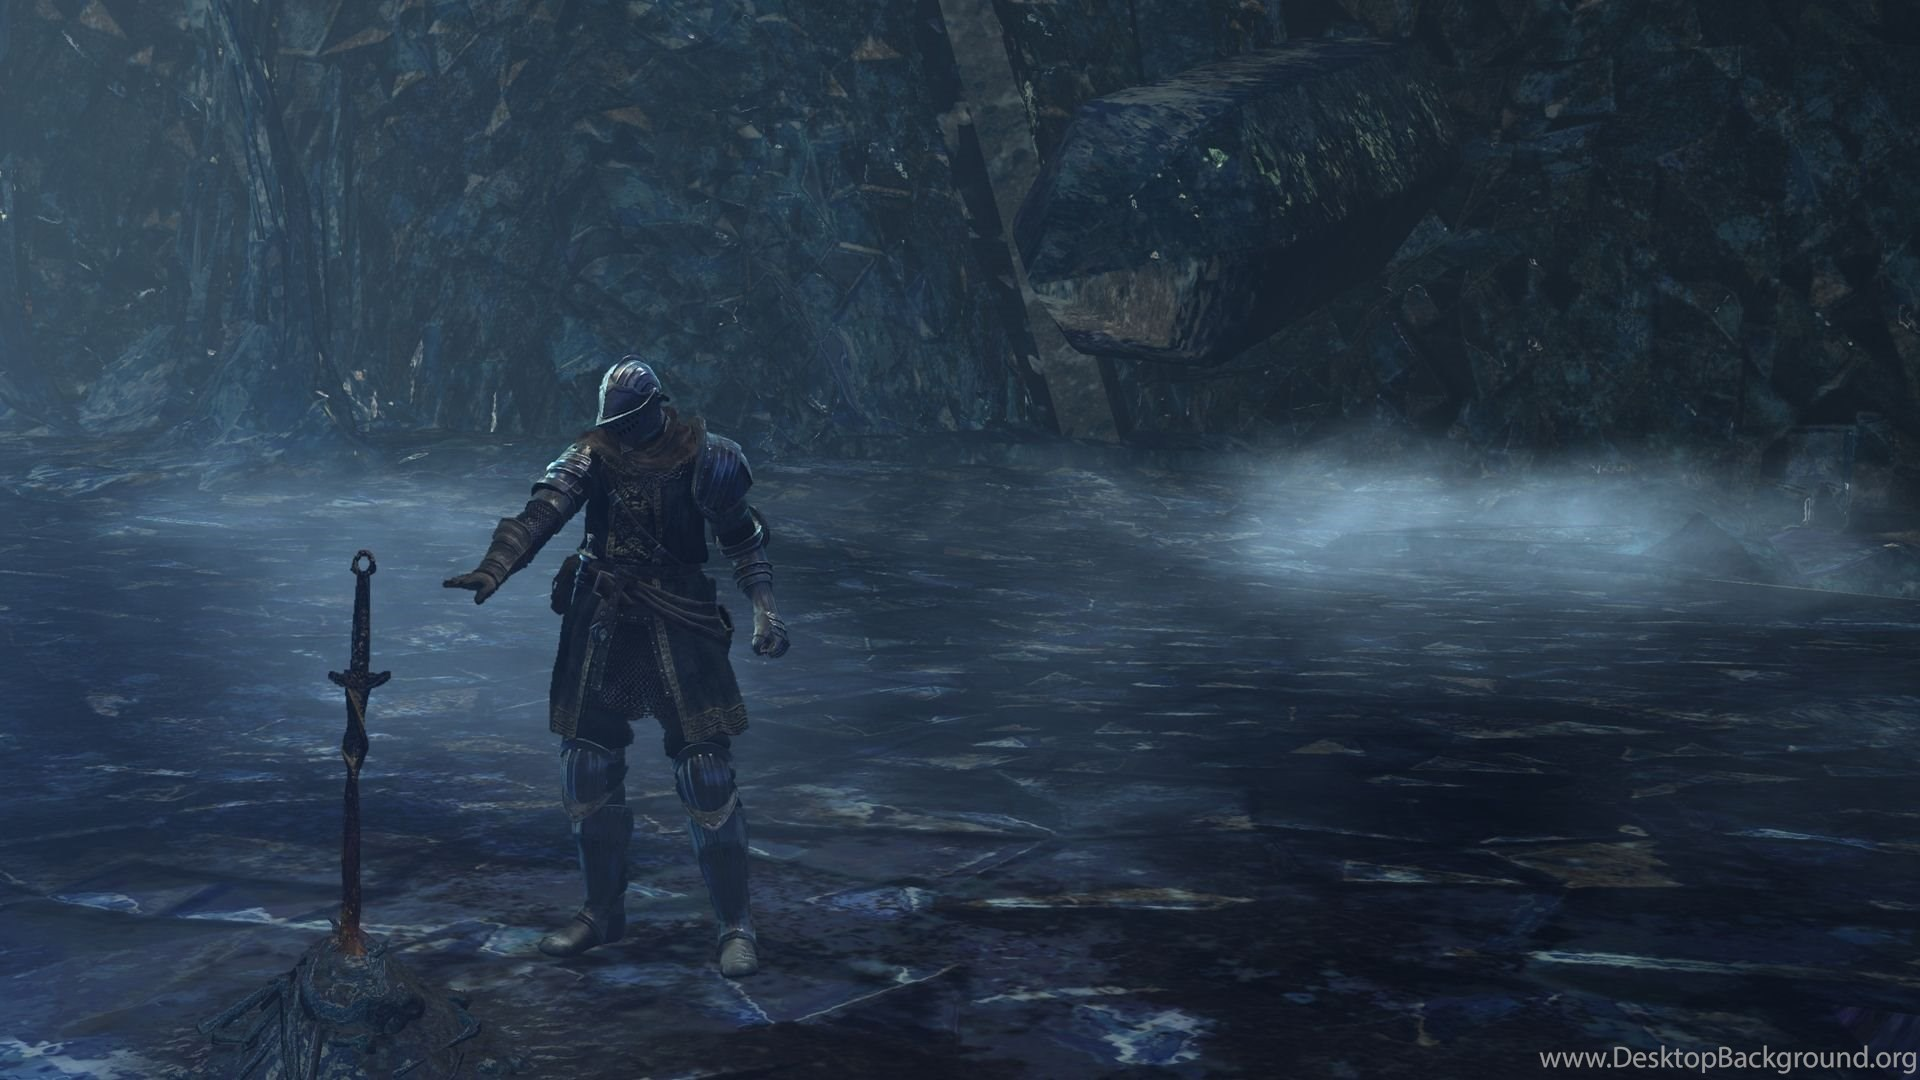 Dark Souls HD Wallpapers And Backgrounds Desktop Background